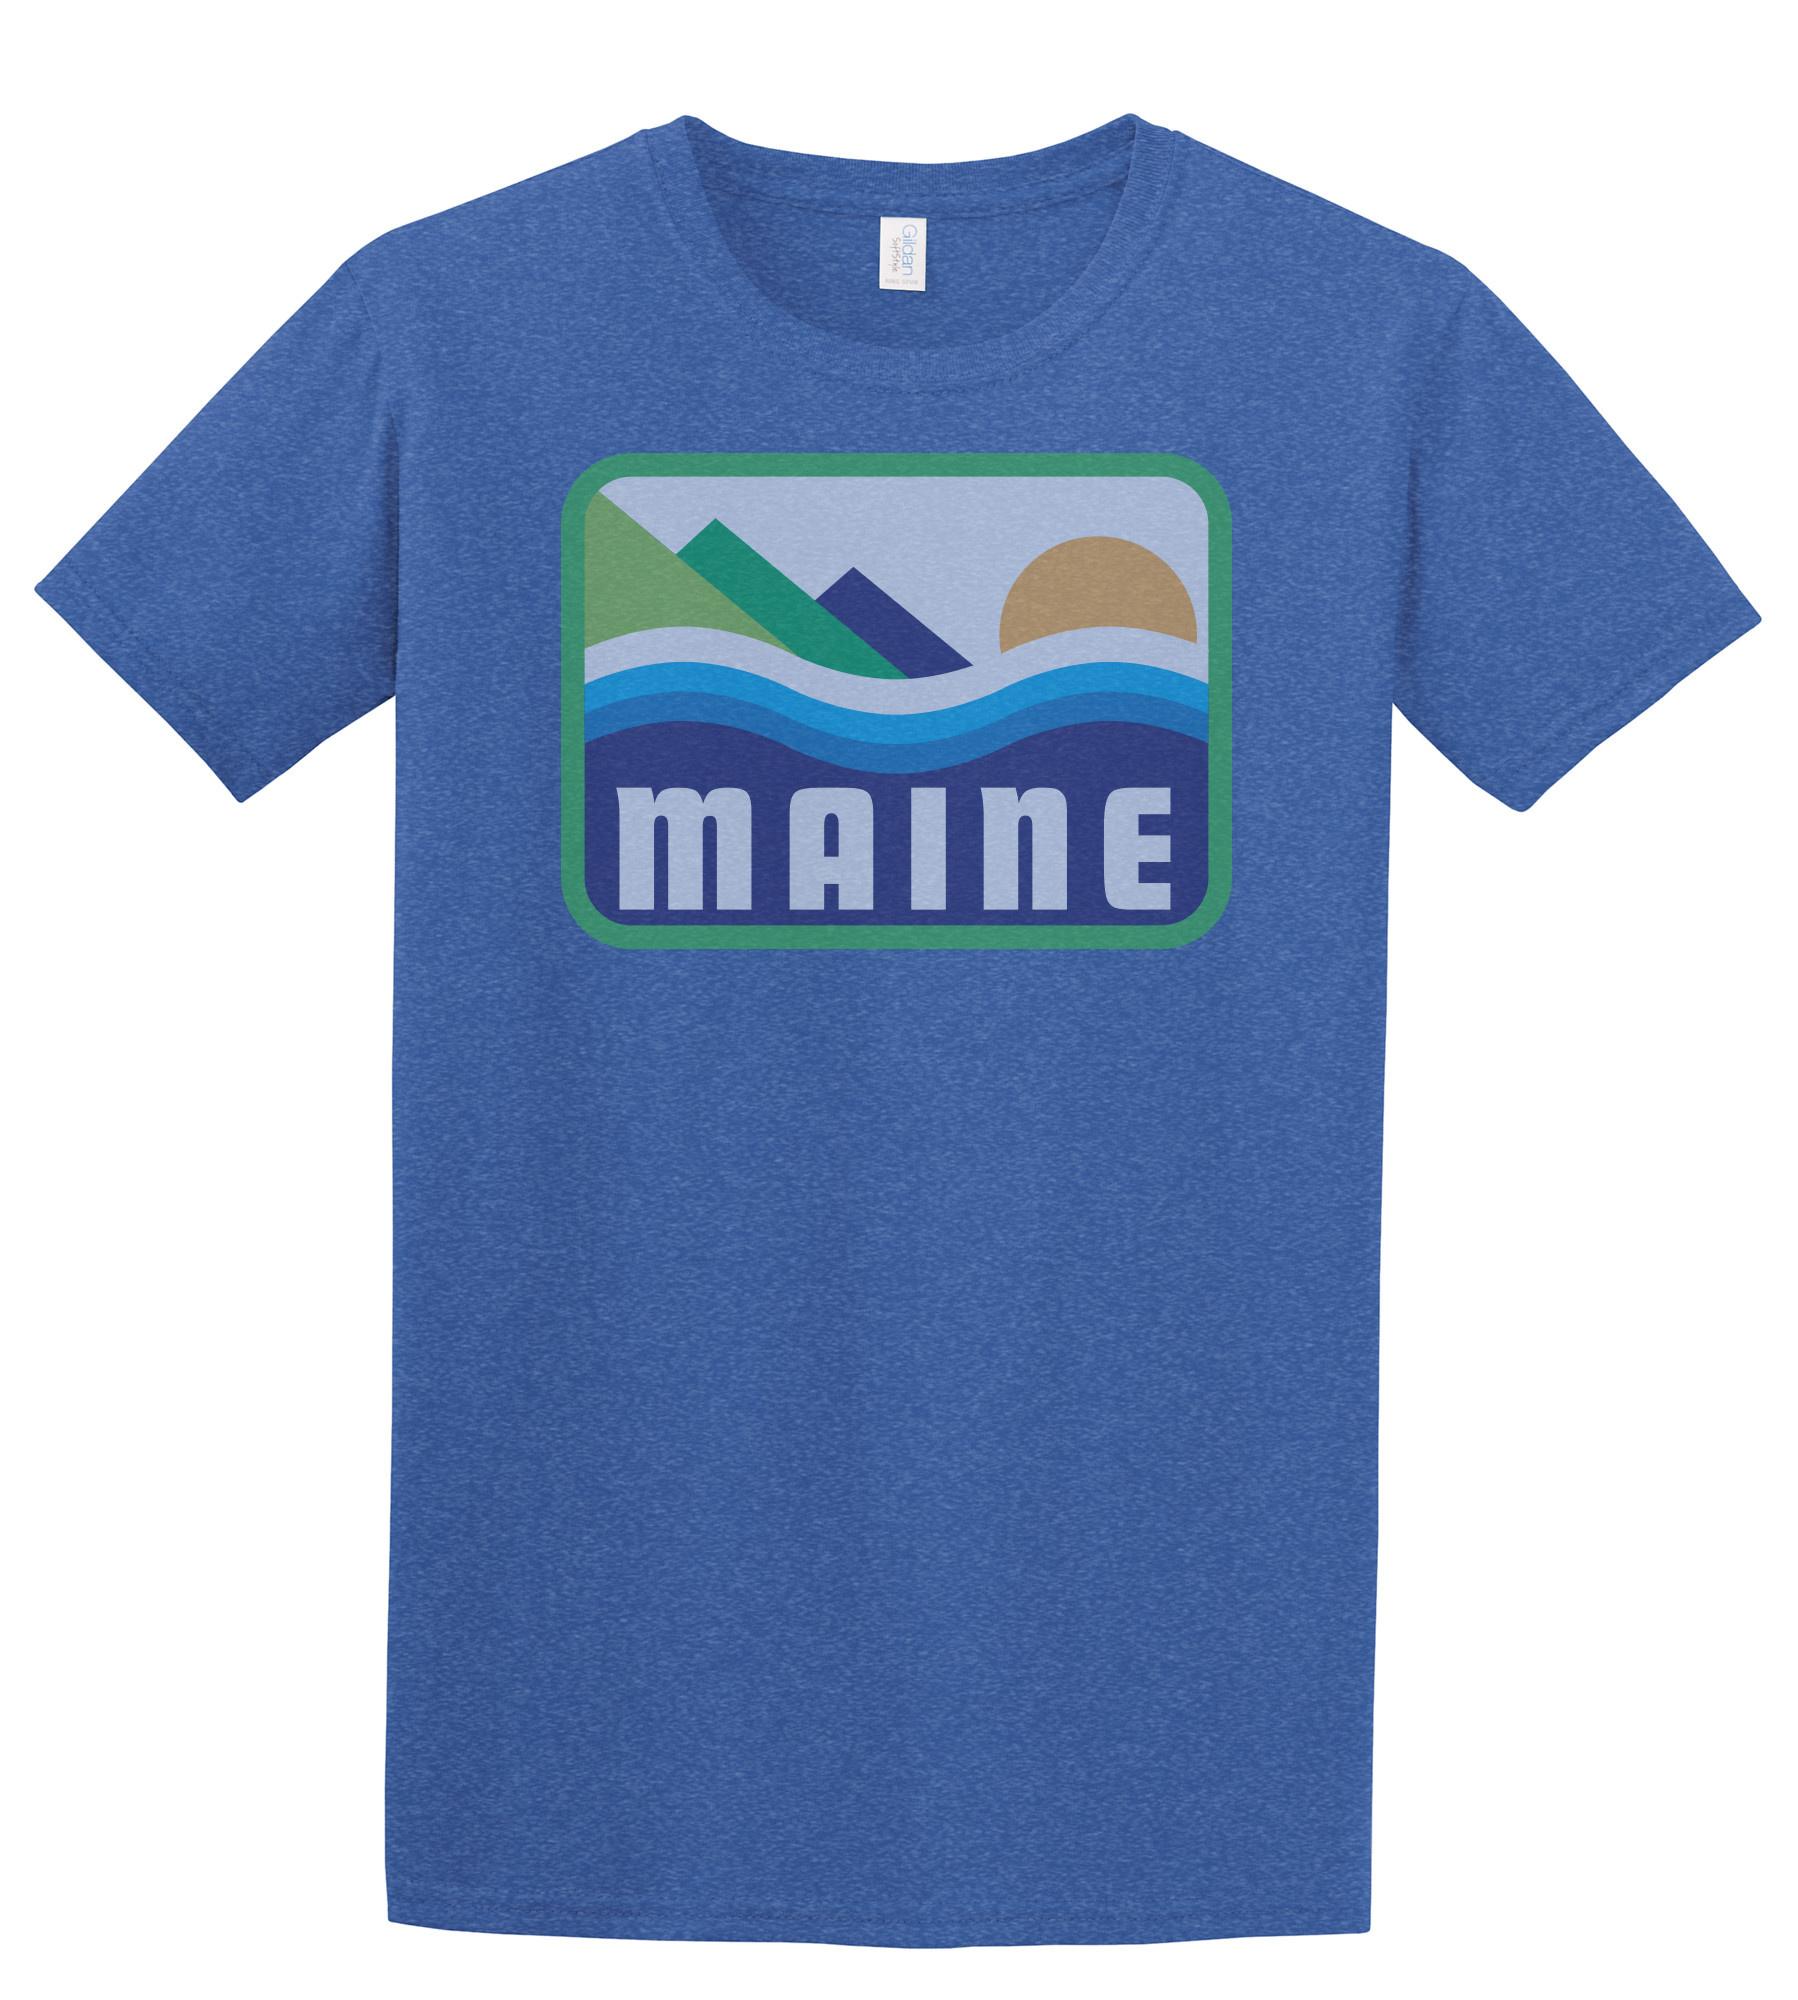 Woods & Sea Woods & Sea - Patamania T-Shirt - Adult - Heather Royal Blue